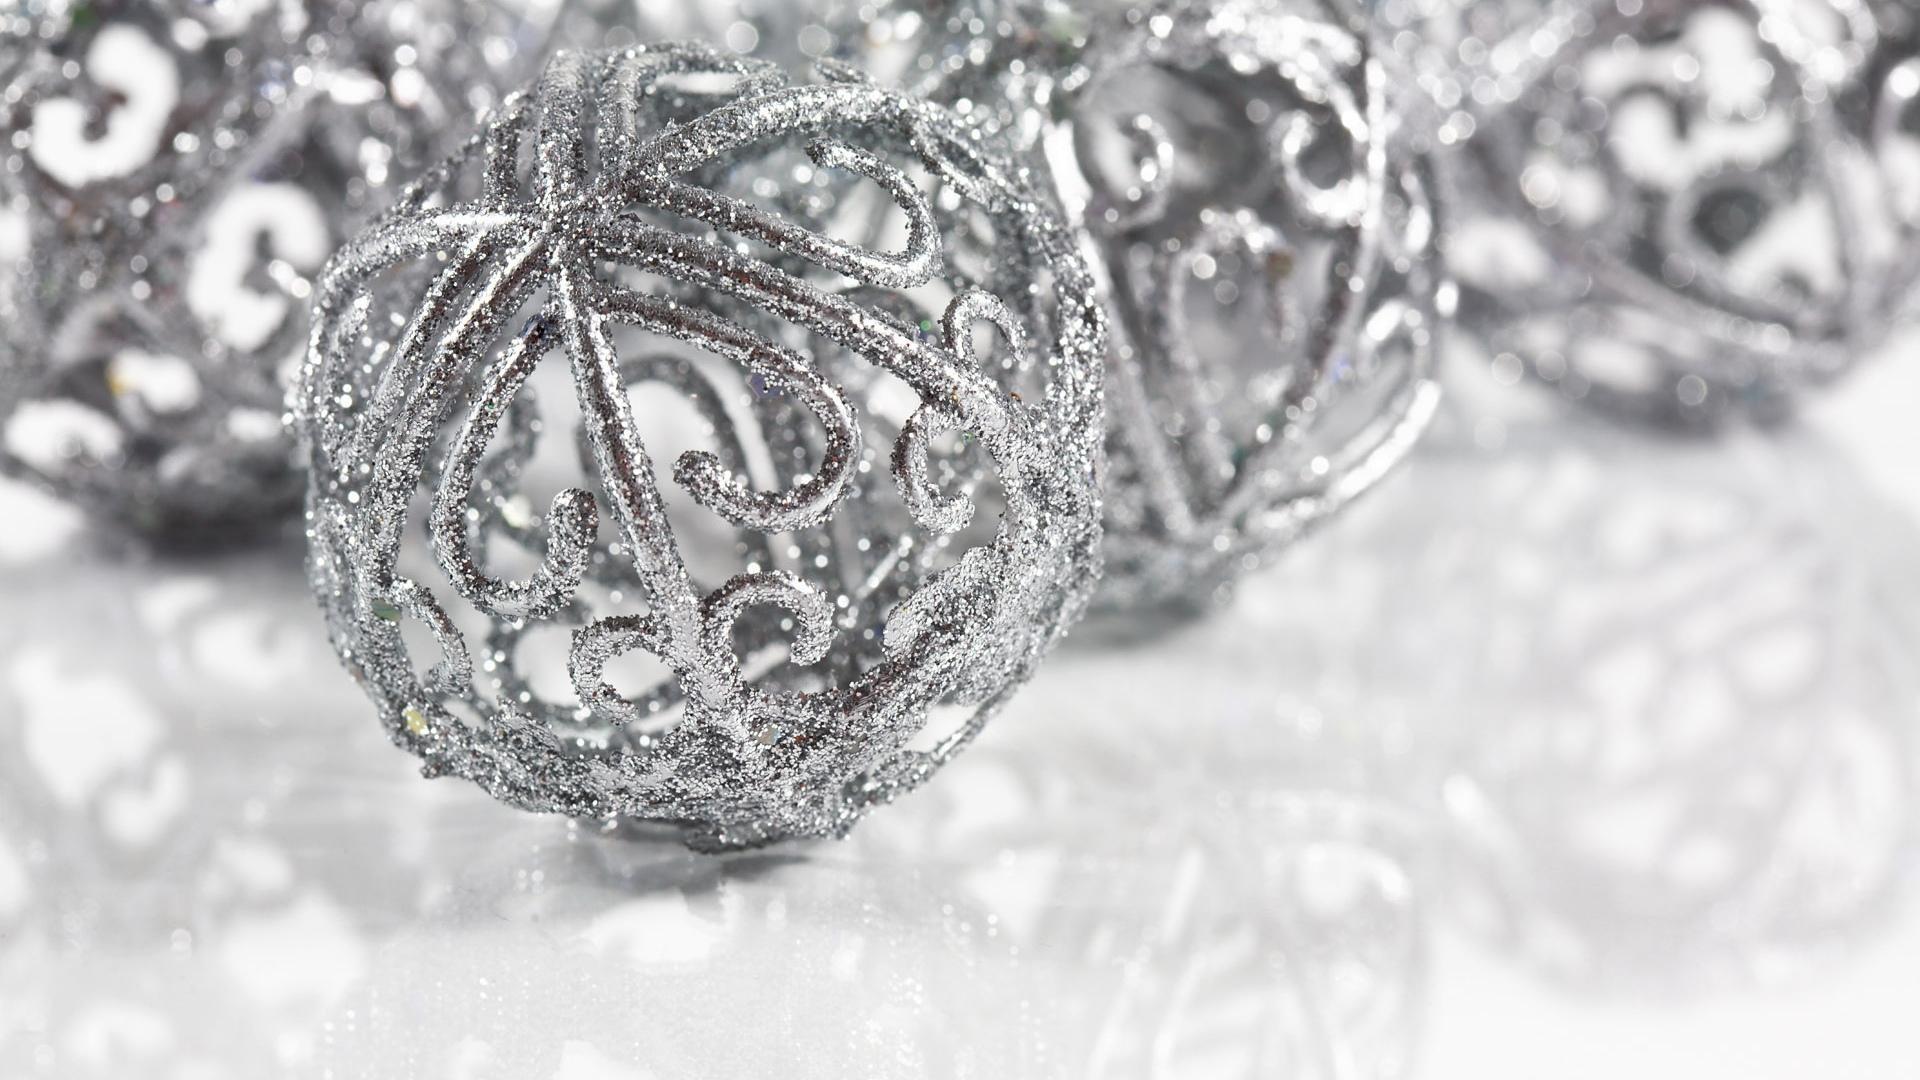 Holidays Christmas Seasonal Festive Desktop Images